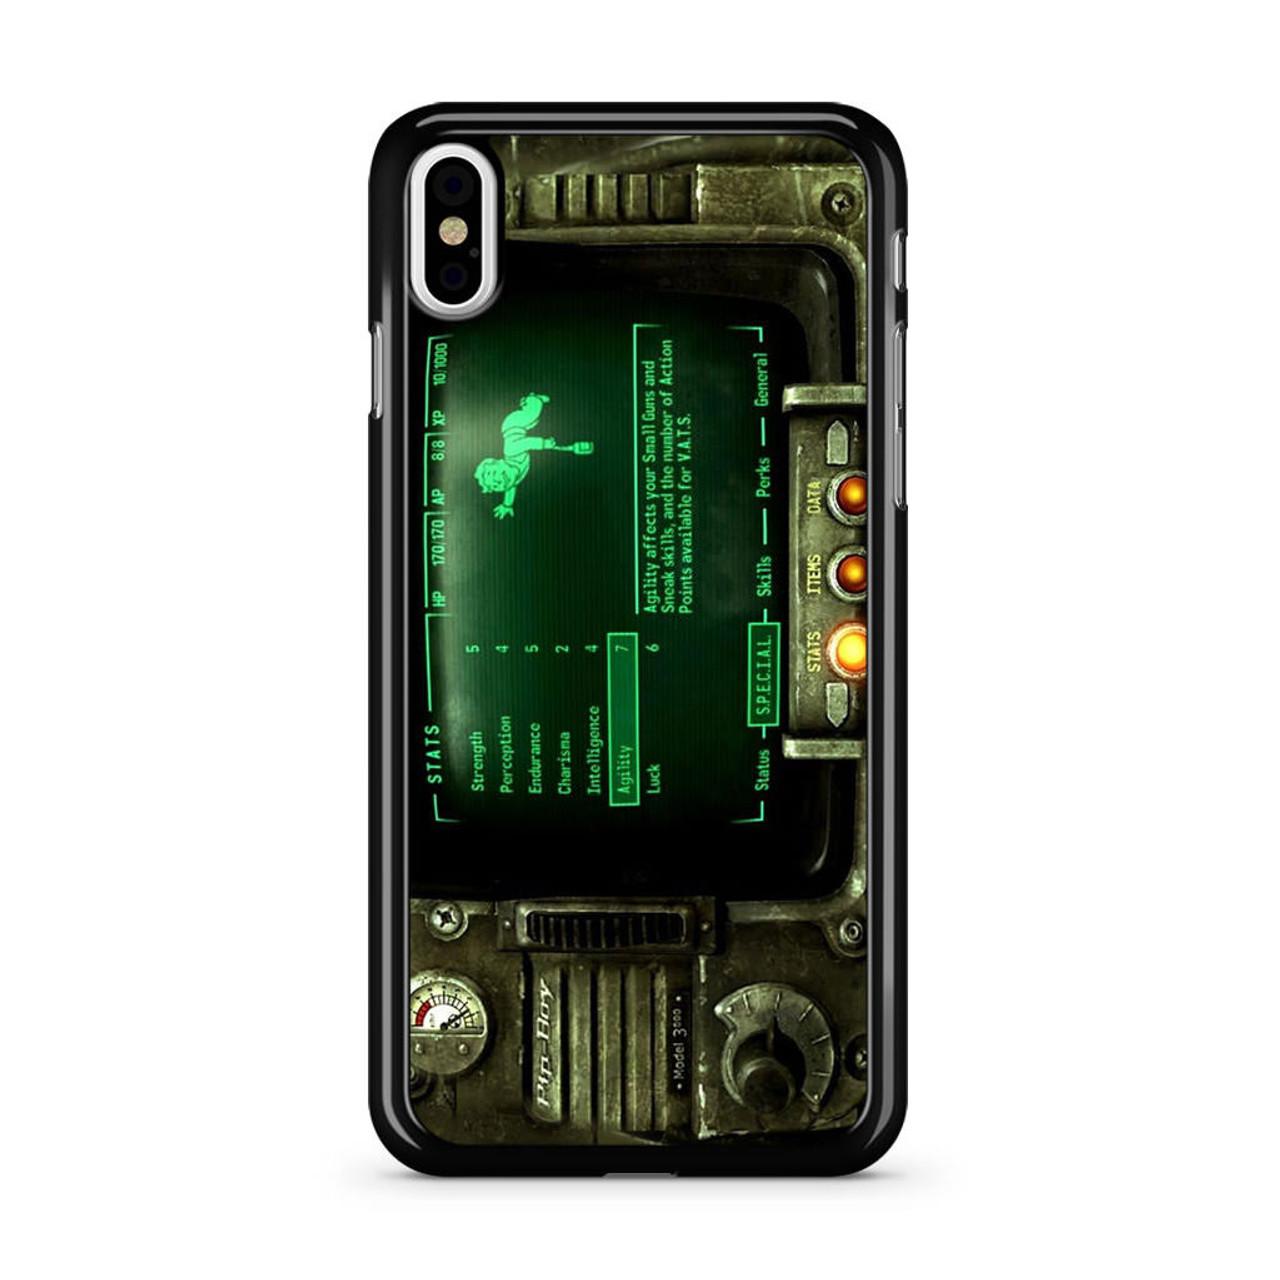 pipboy 3000 iphone